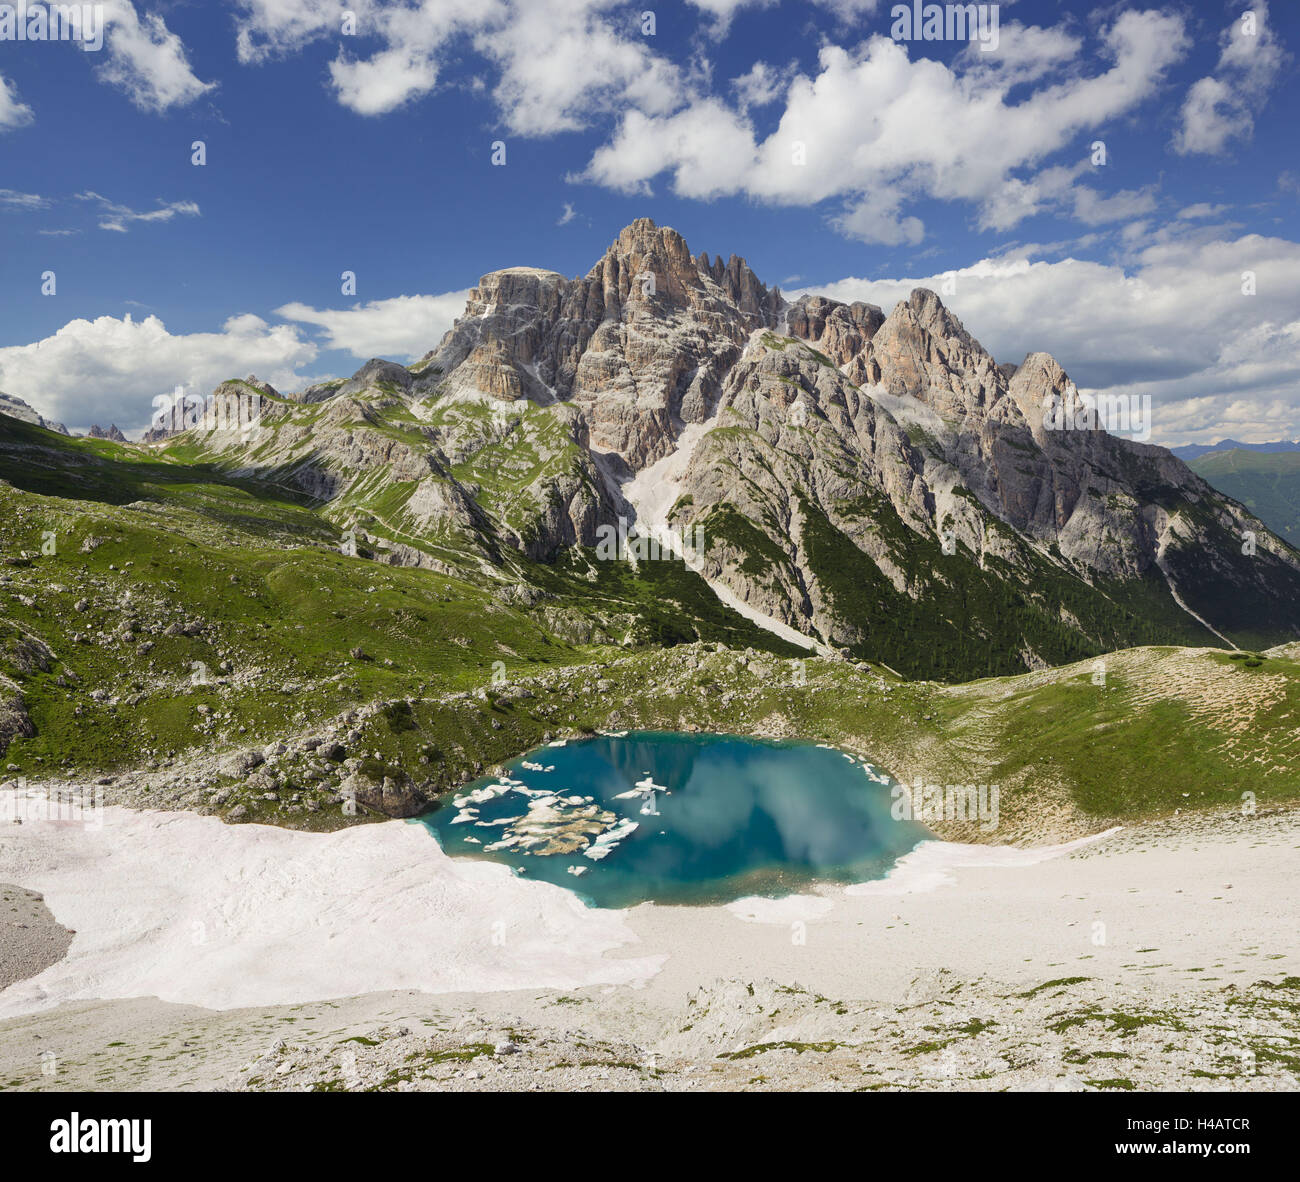 Neunerkofel, snowfield, ice lake, South Tirol, the Dolomites mountains, Italy - Stock Image